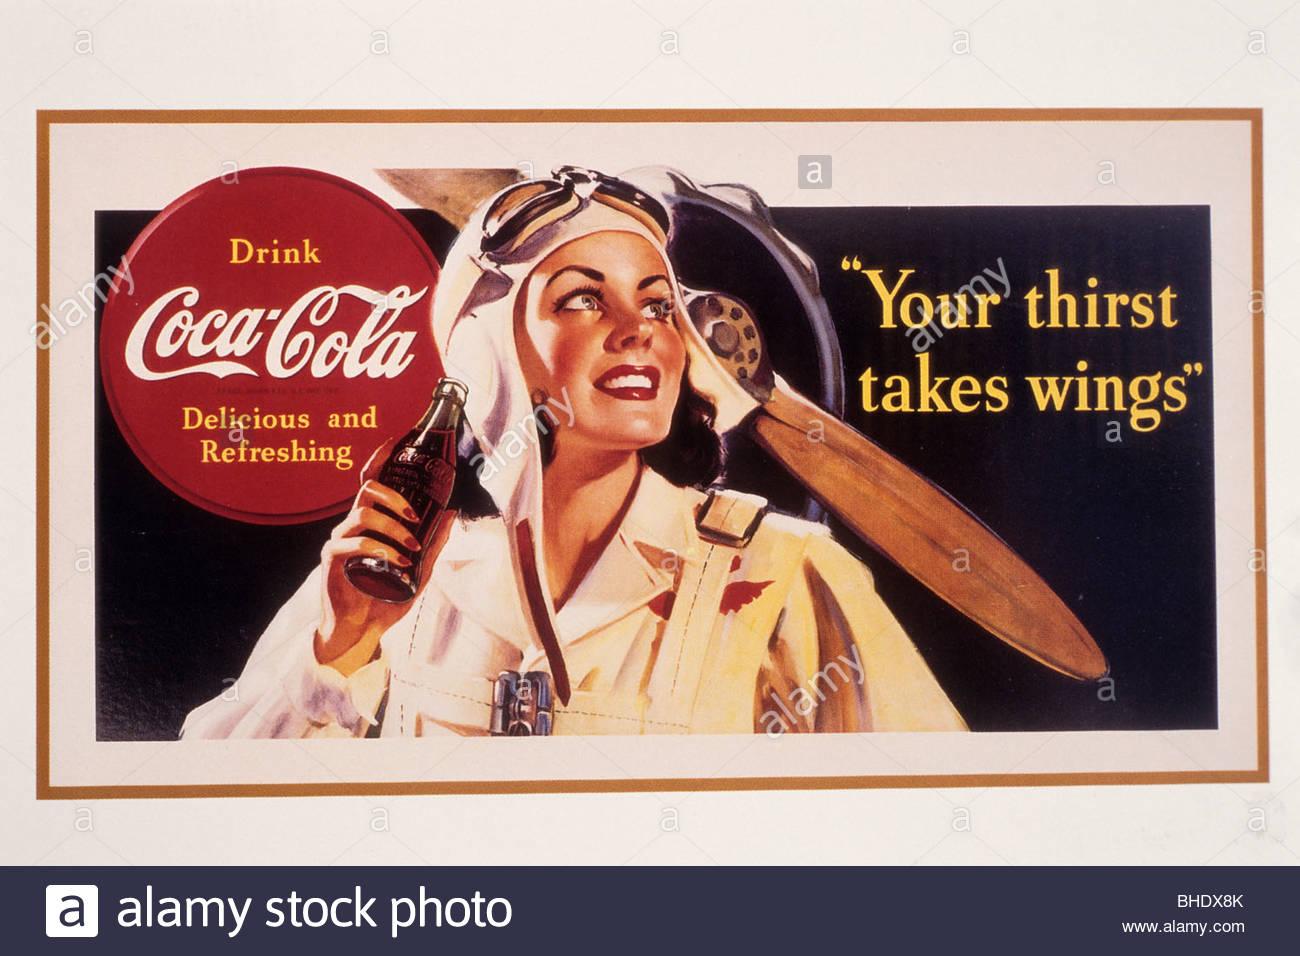 old coca cola poster atlanta georgia u s a stock photo 27965523 alamy. Black Bedroom Furniture Sets. Home Design Ideas